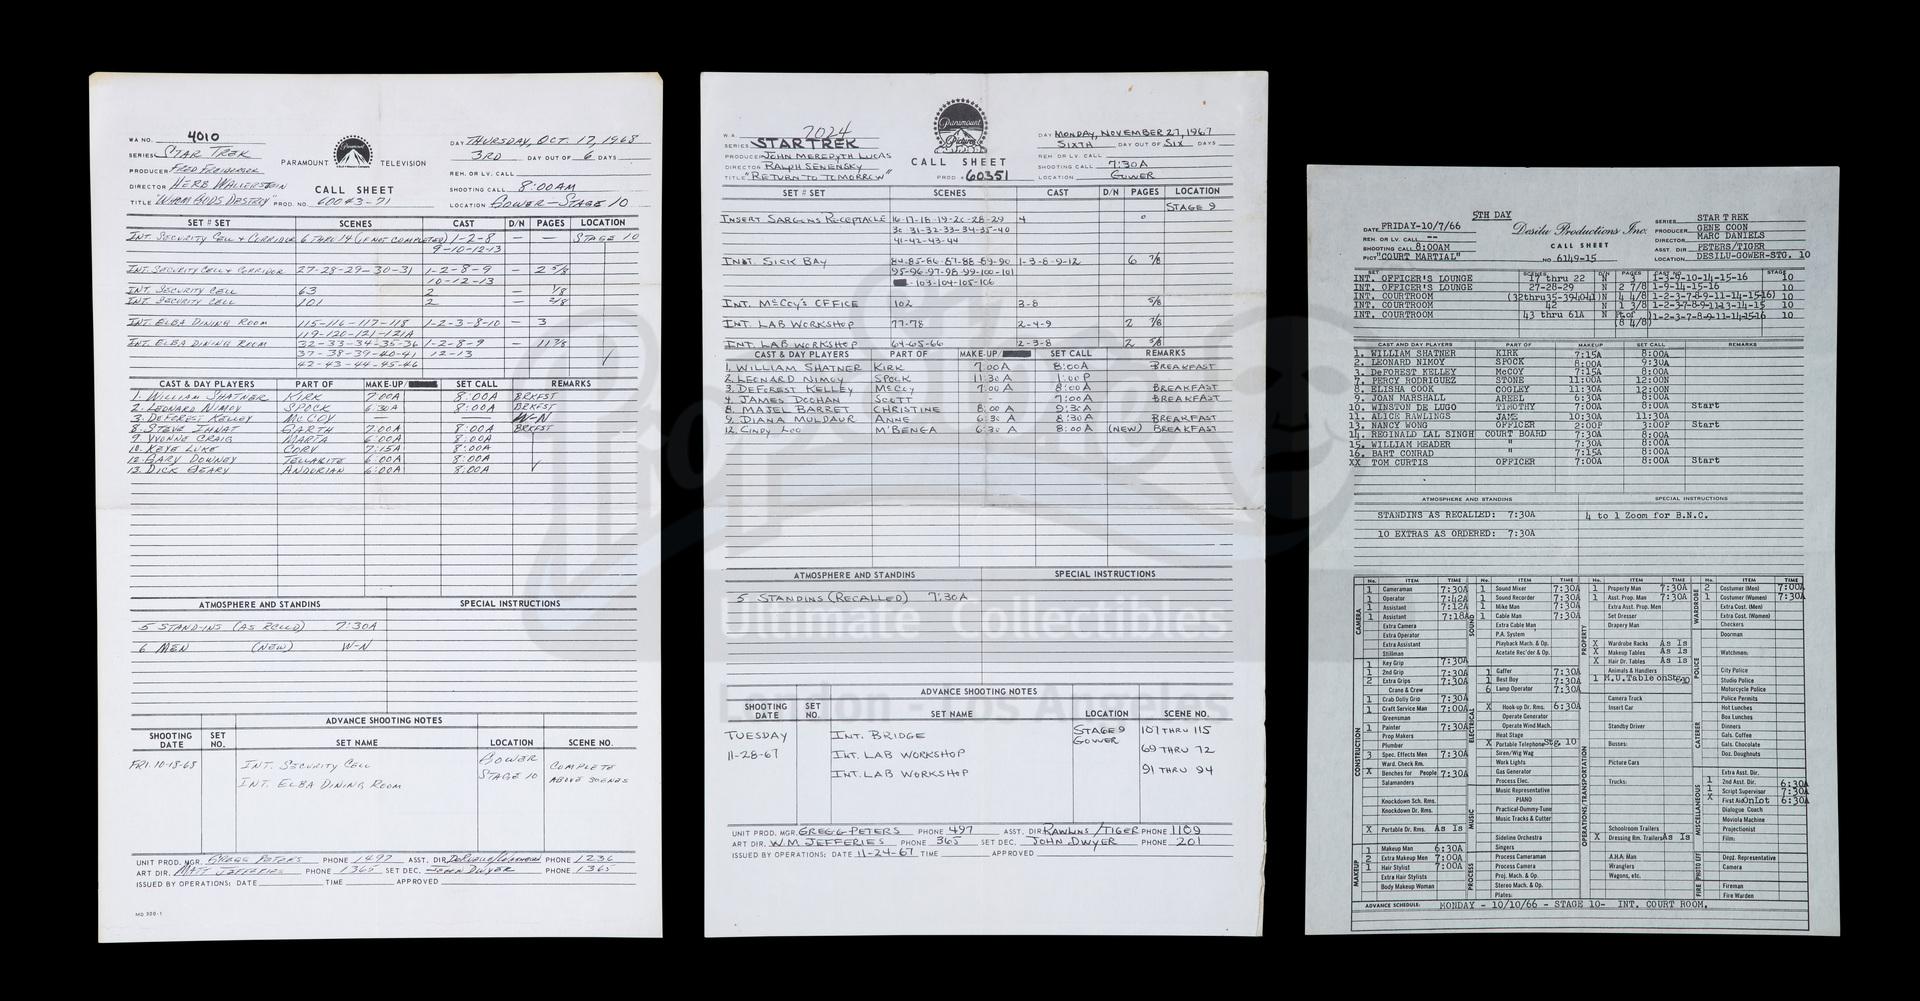 Lot # 1051: STAR TREK: THE ORIGINAL SERIES - Set of Three Call Sheets